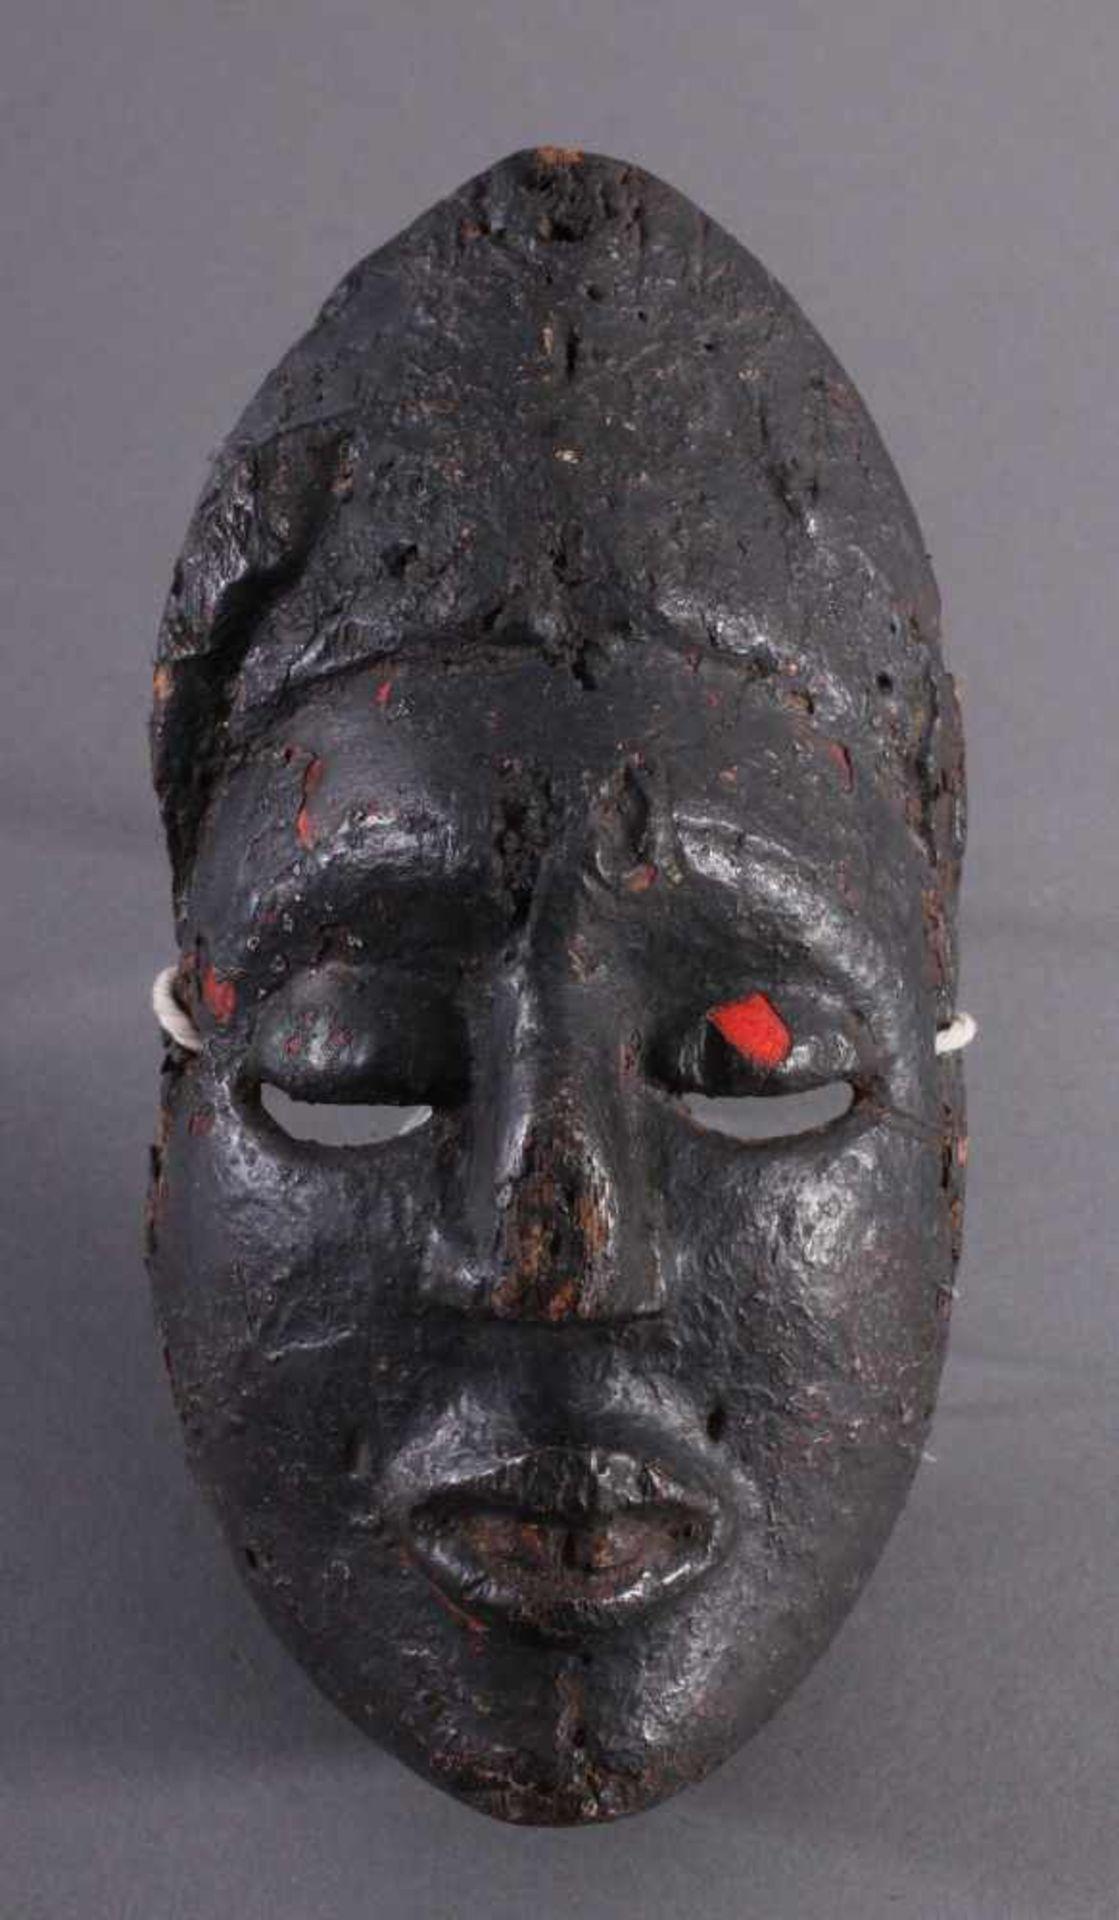 Antike Afrikanische Maske, 1. Hälfte 20. Jh.Braunes Holz, rot bemalt, schwarze Patina mit